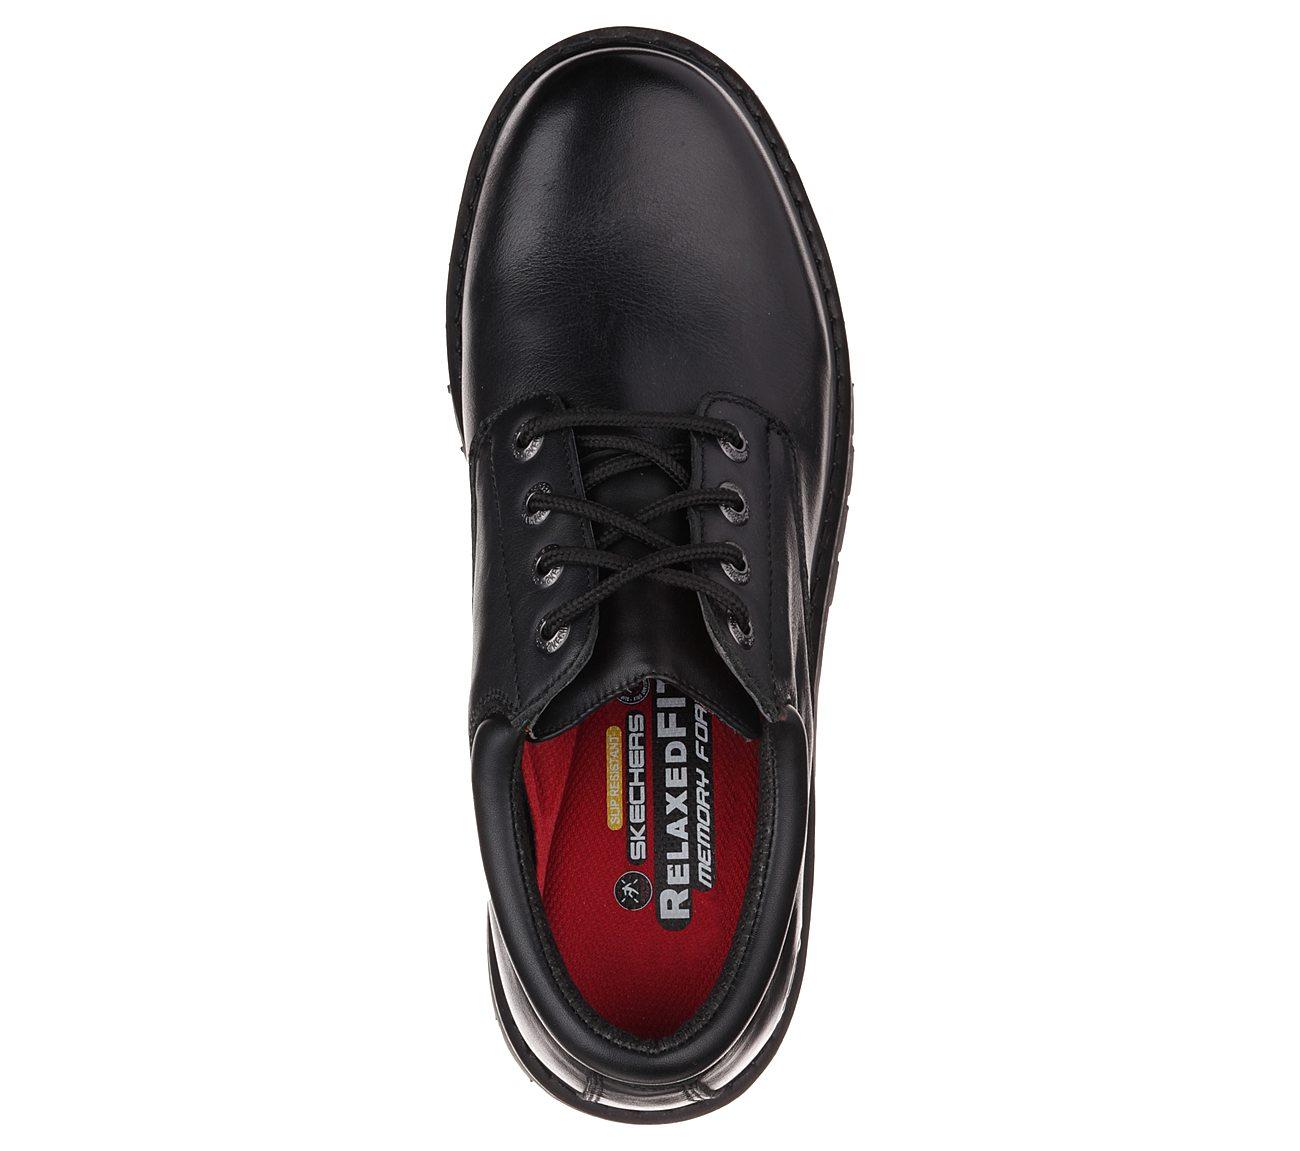 skechers relaxed fit cottonwood elks sr men's non-slip work shoes